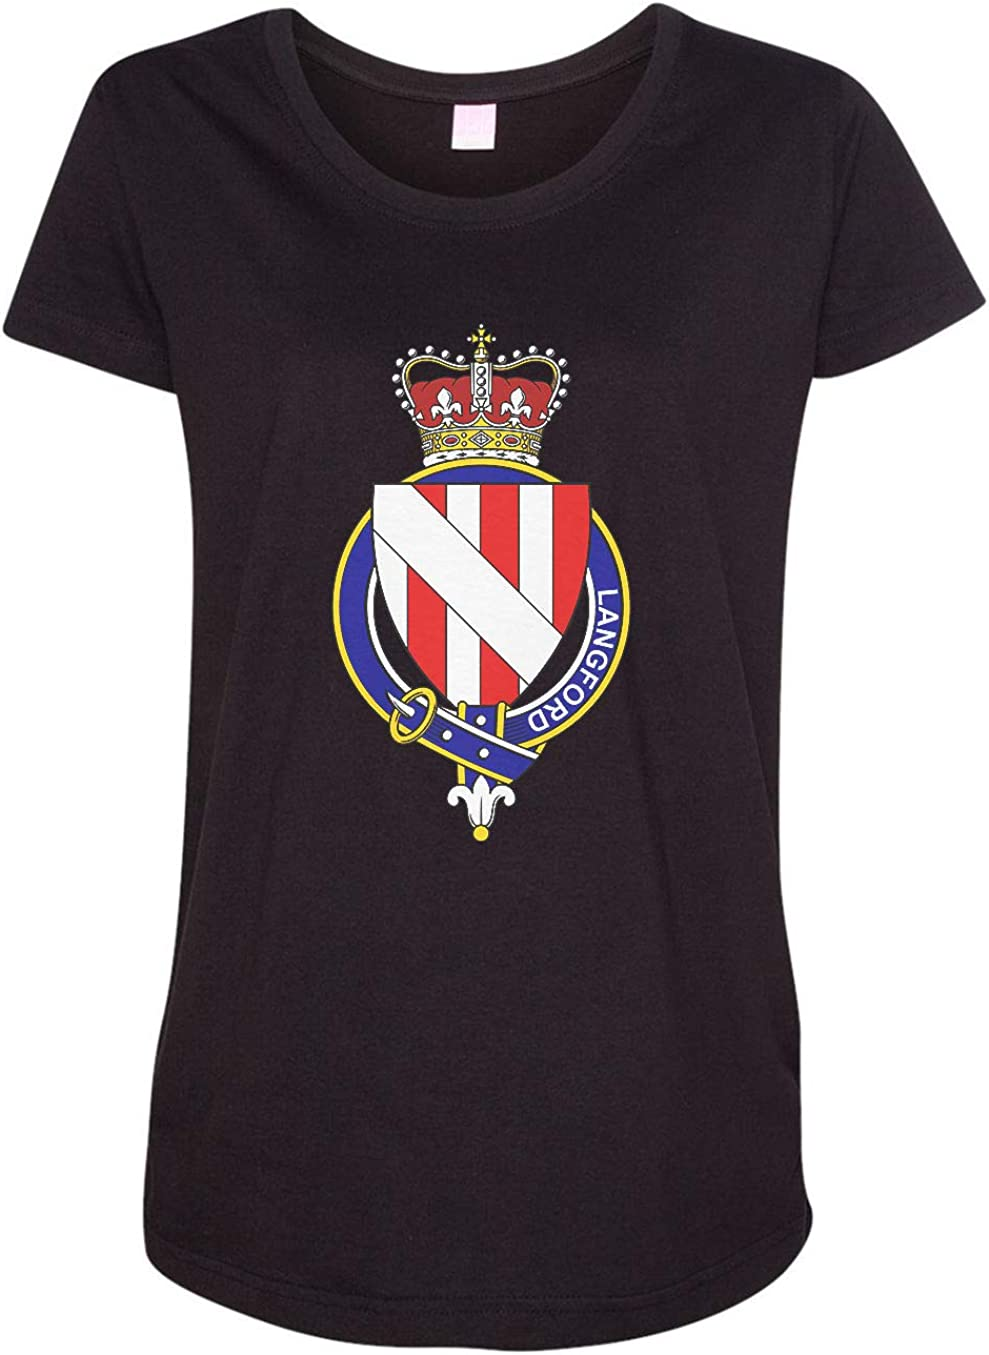 HARD EDGE DESIGN Women's English Garter Family Langford T-Shirt